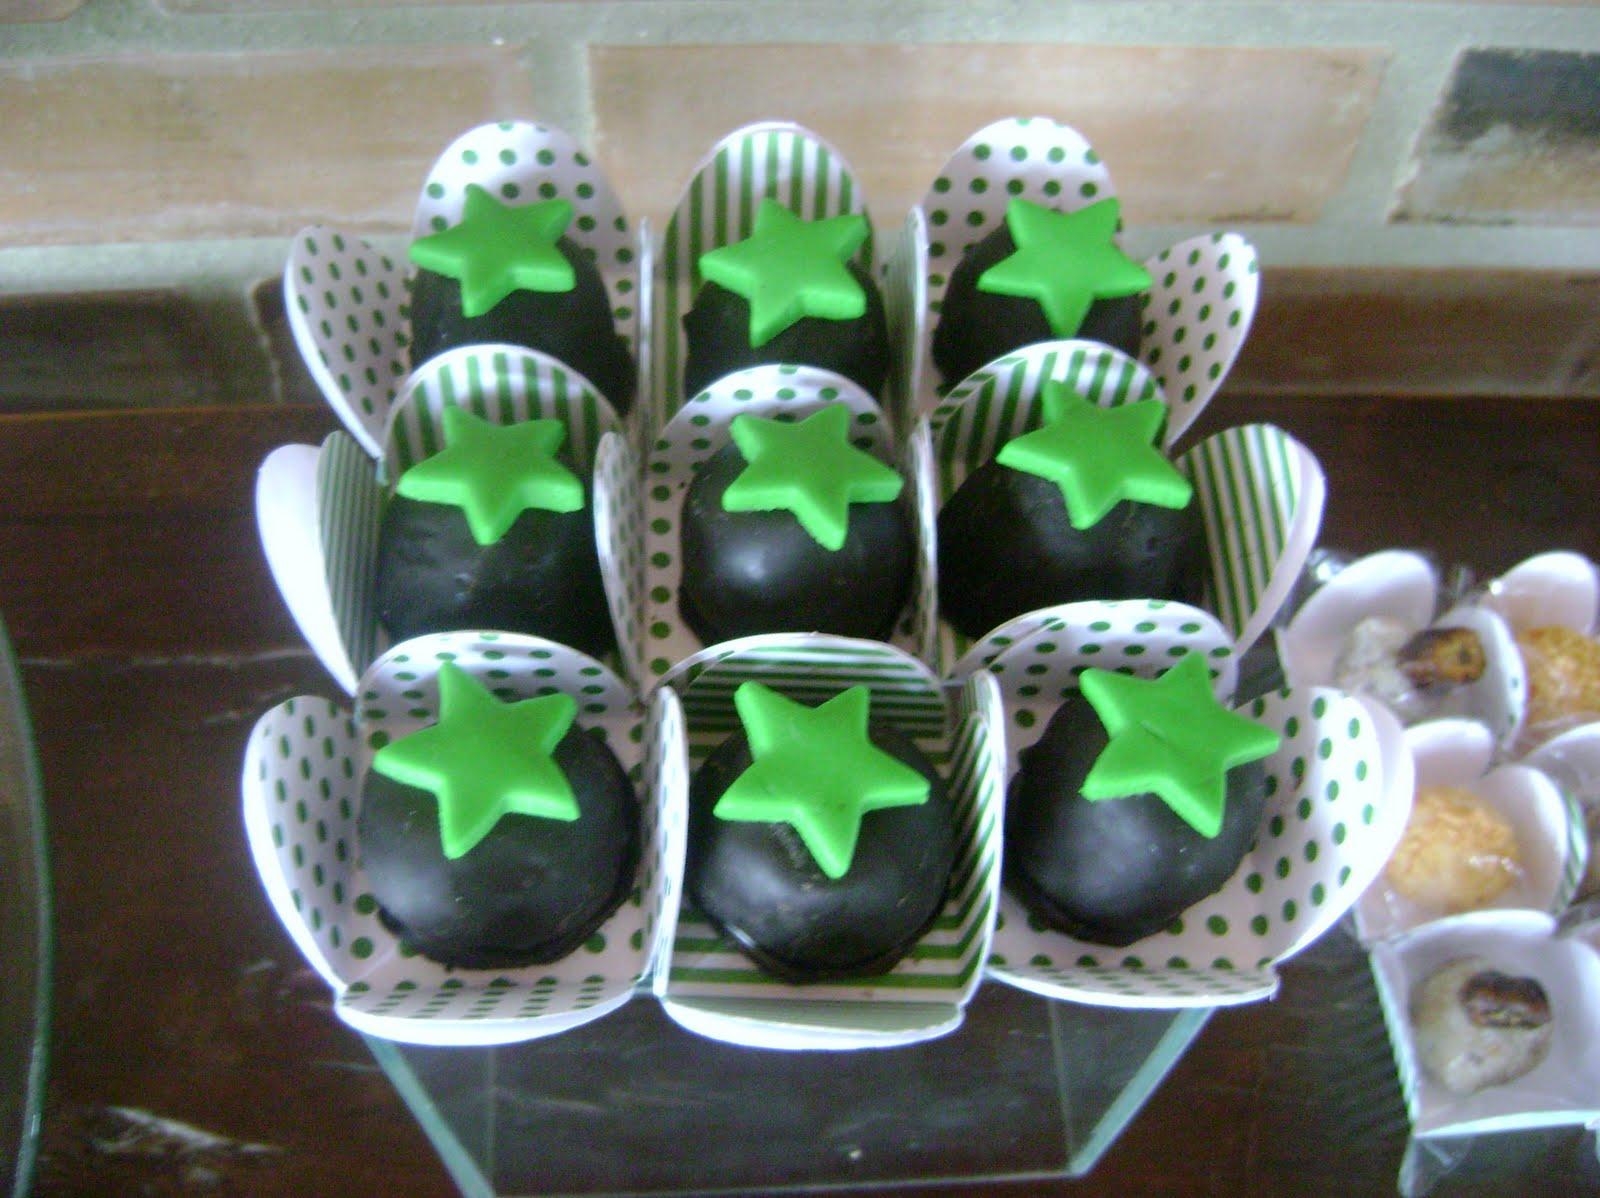 Michelle Lecce Bolos Doces e Chocolates: Aniversário 70 anos do  #2F9C45 1600 1198